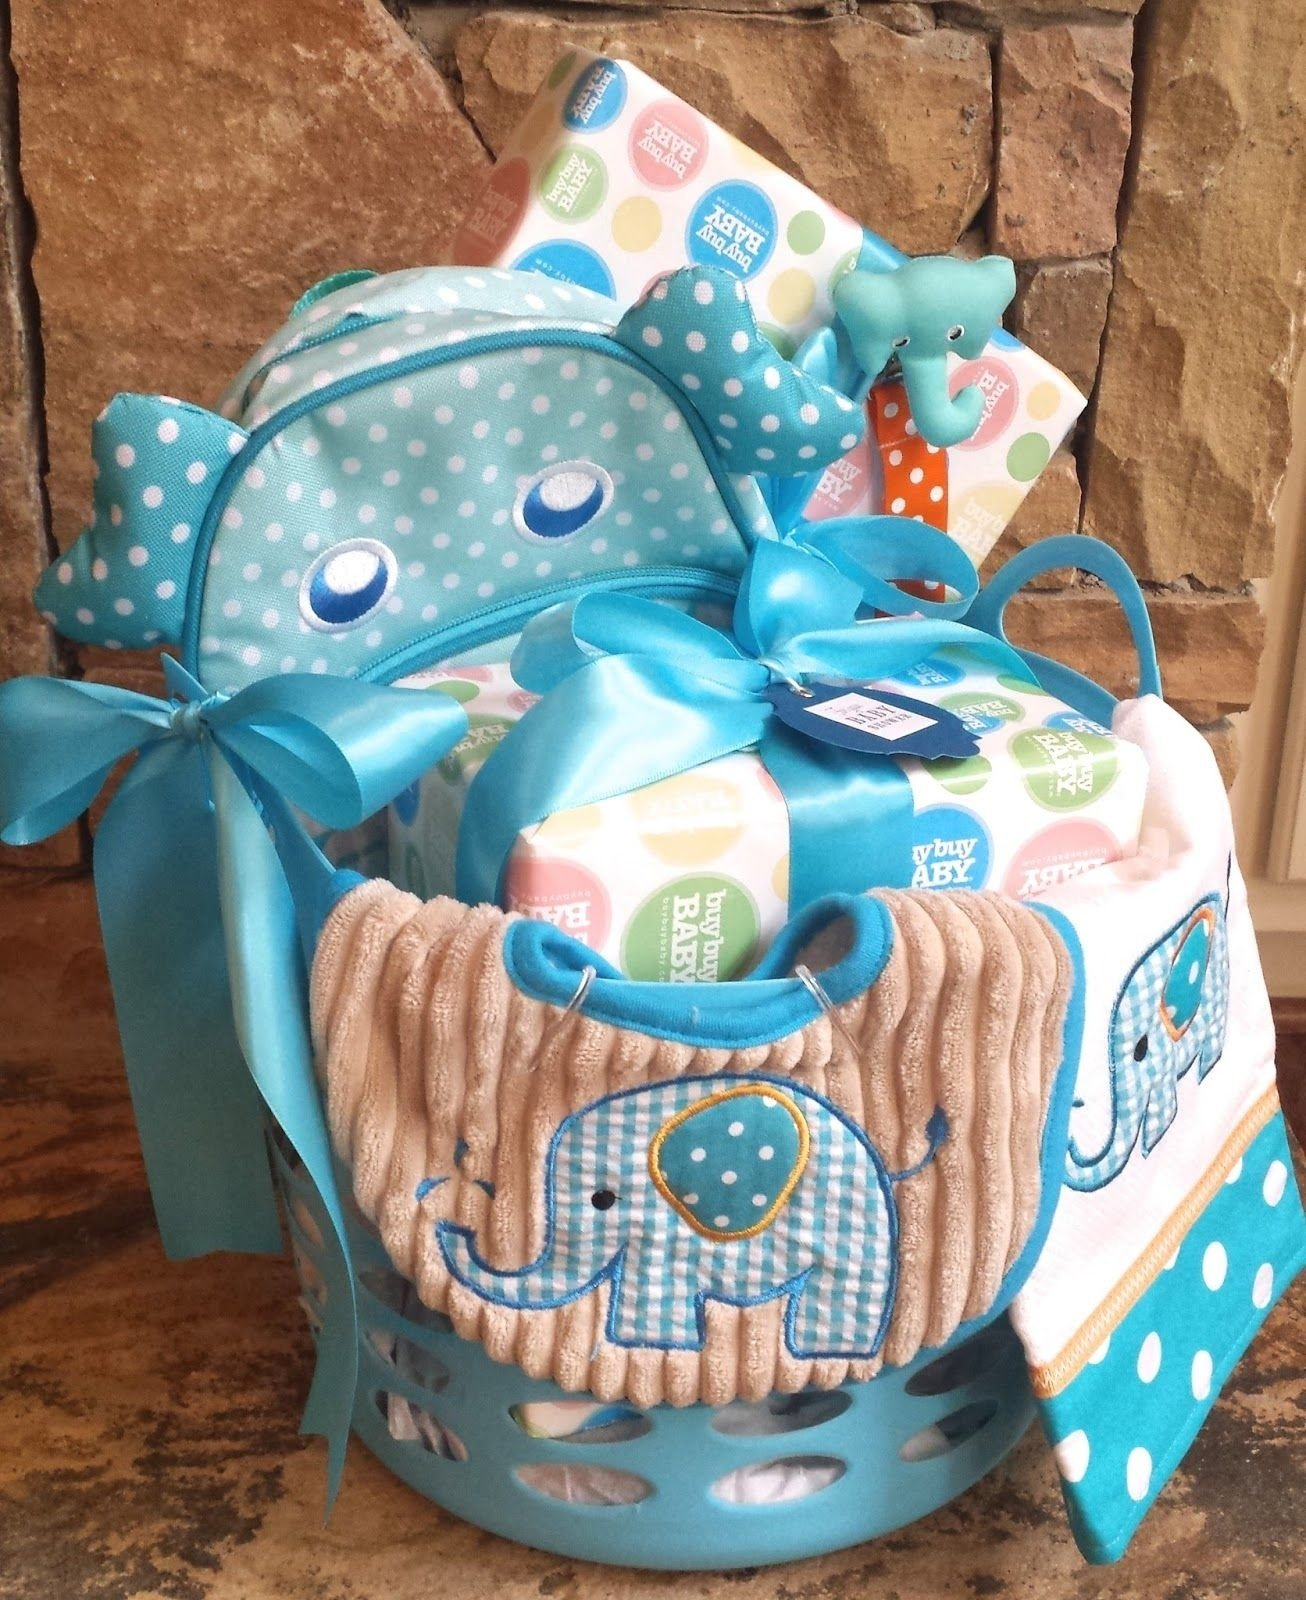 10 Most Popular Baby Boy Gift Basket Ideas tips for arranging gift baskets elephant baby shower basket baby 2020